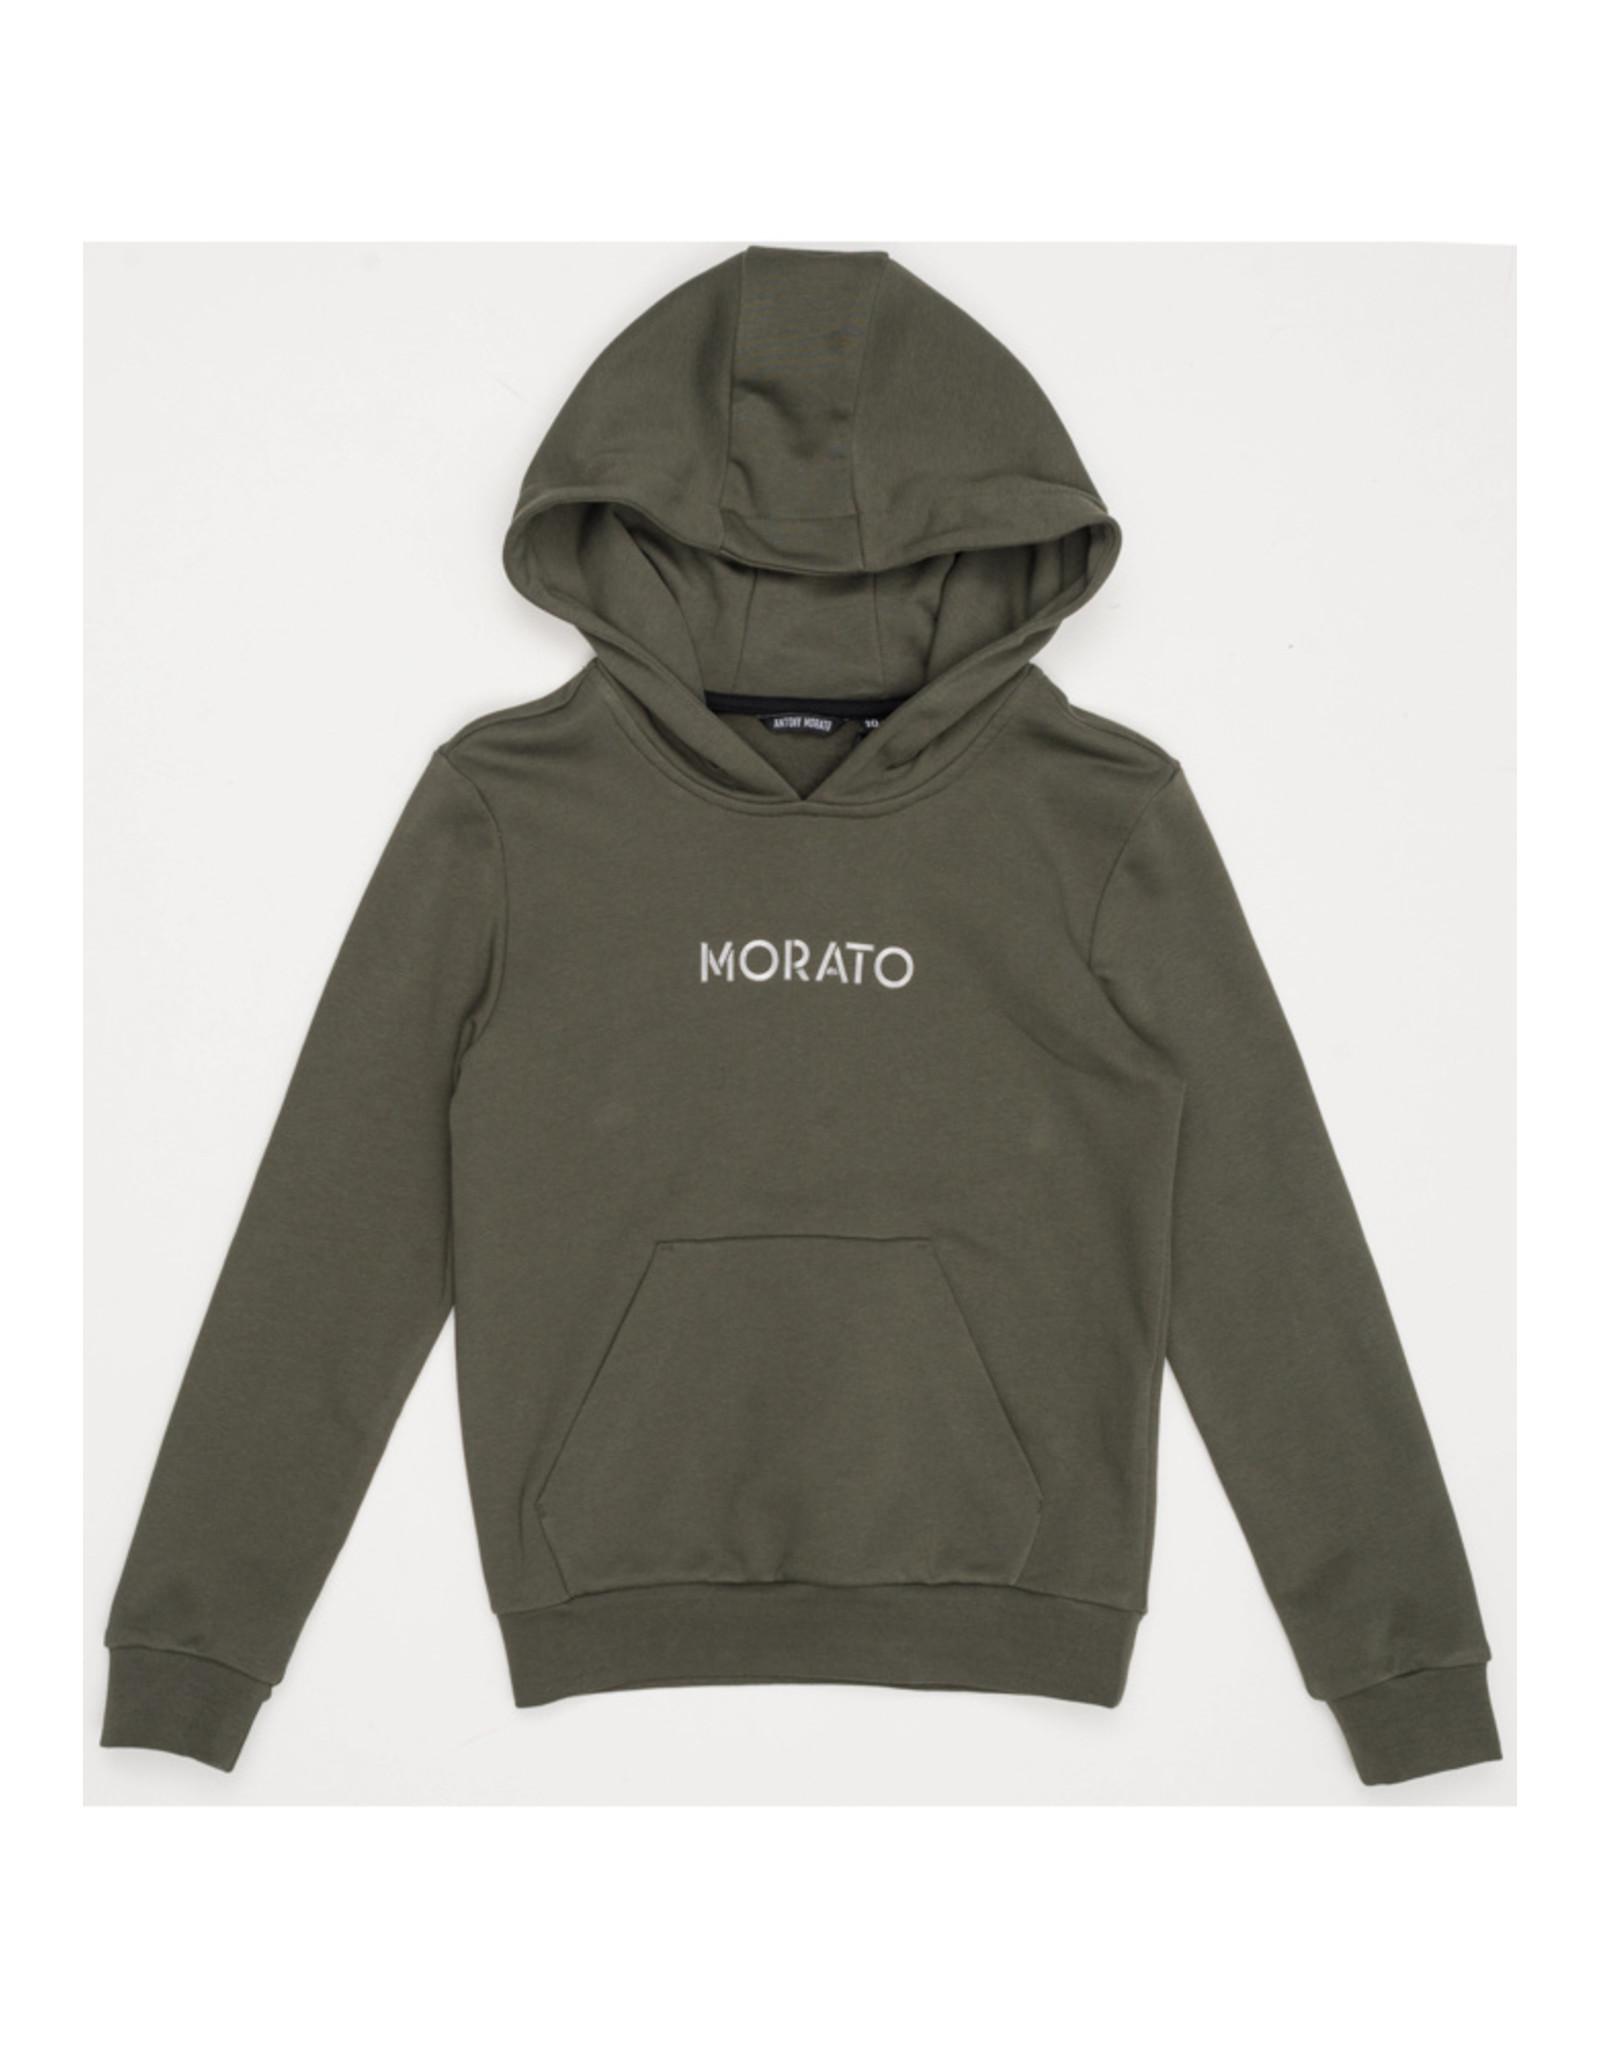 Antony Morato Sweatshirt Forest Green